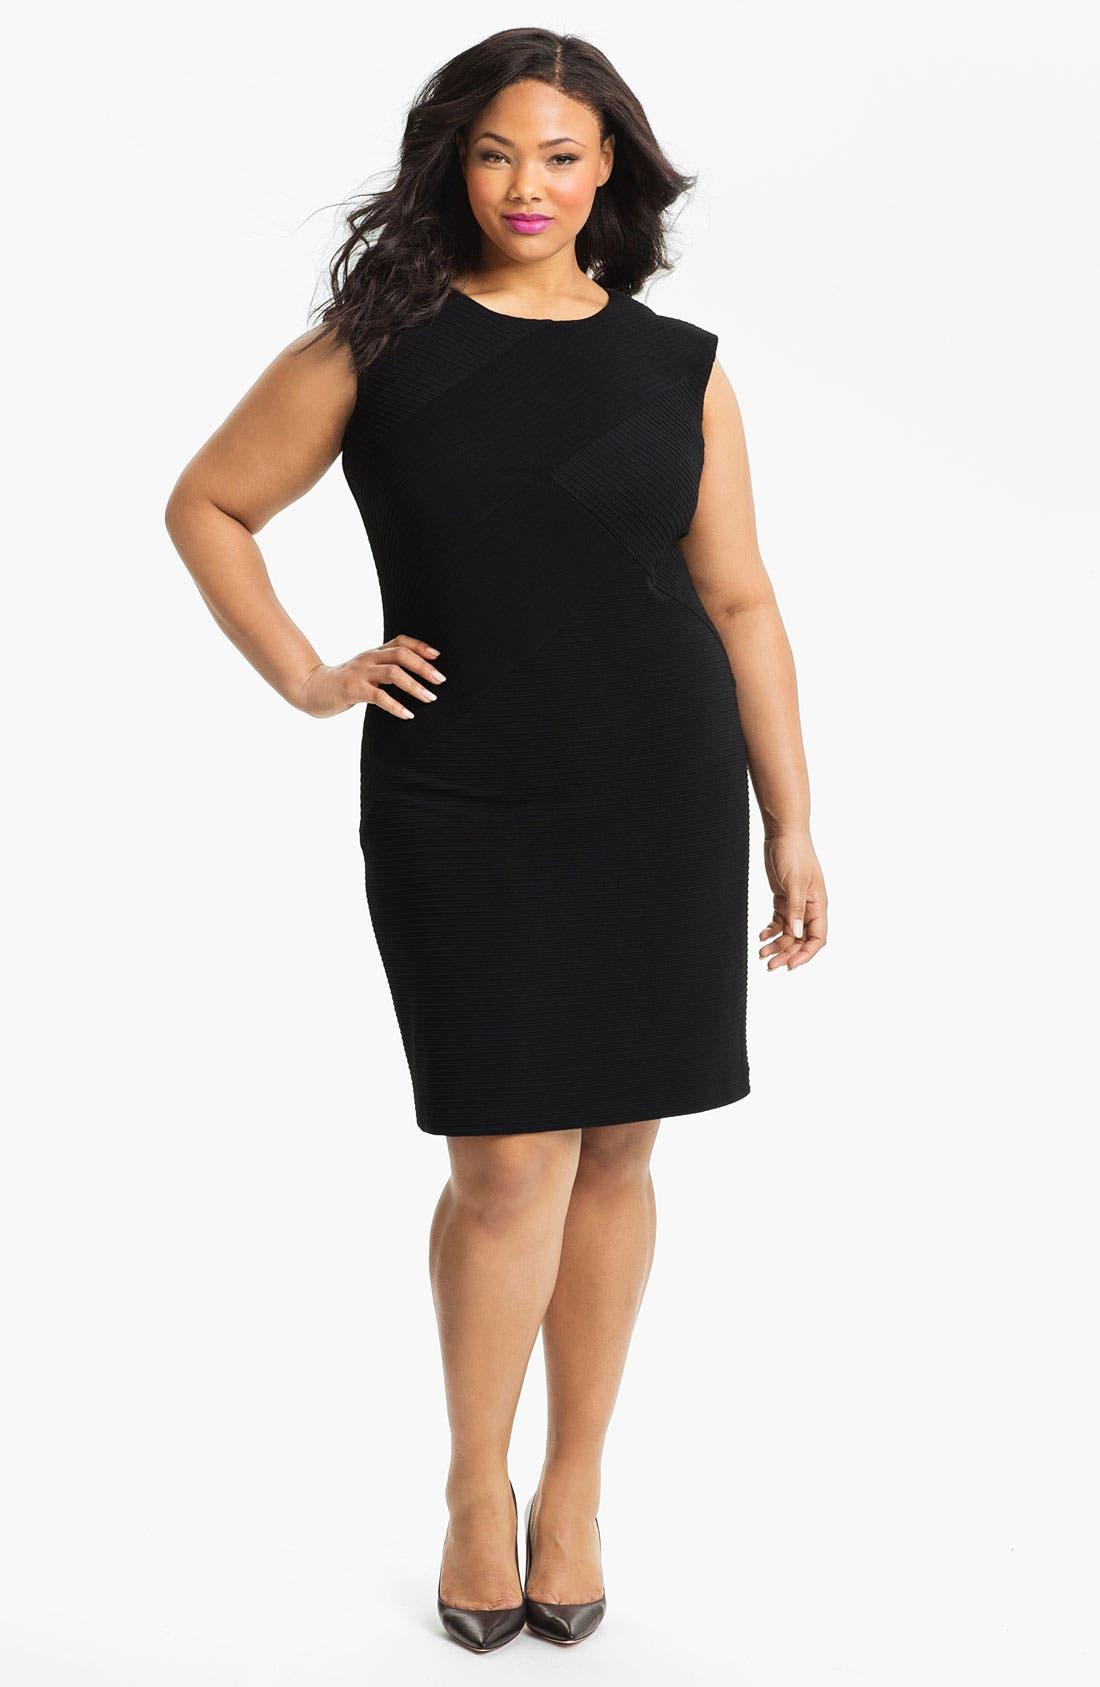 Alternate Image 1 Selected - Calvin Klein Textured Jersey Sheath Dress (Plus)